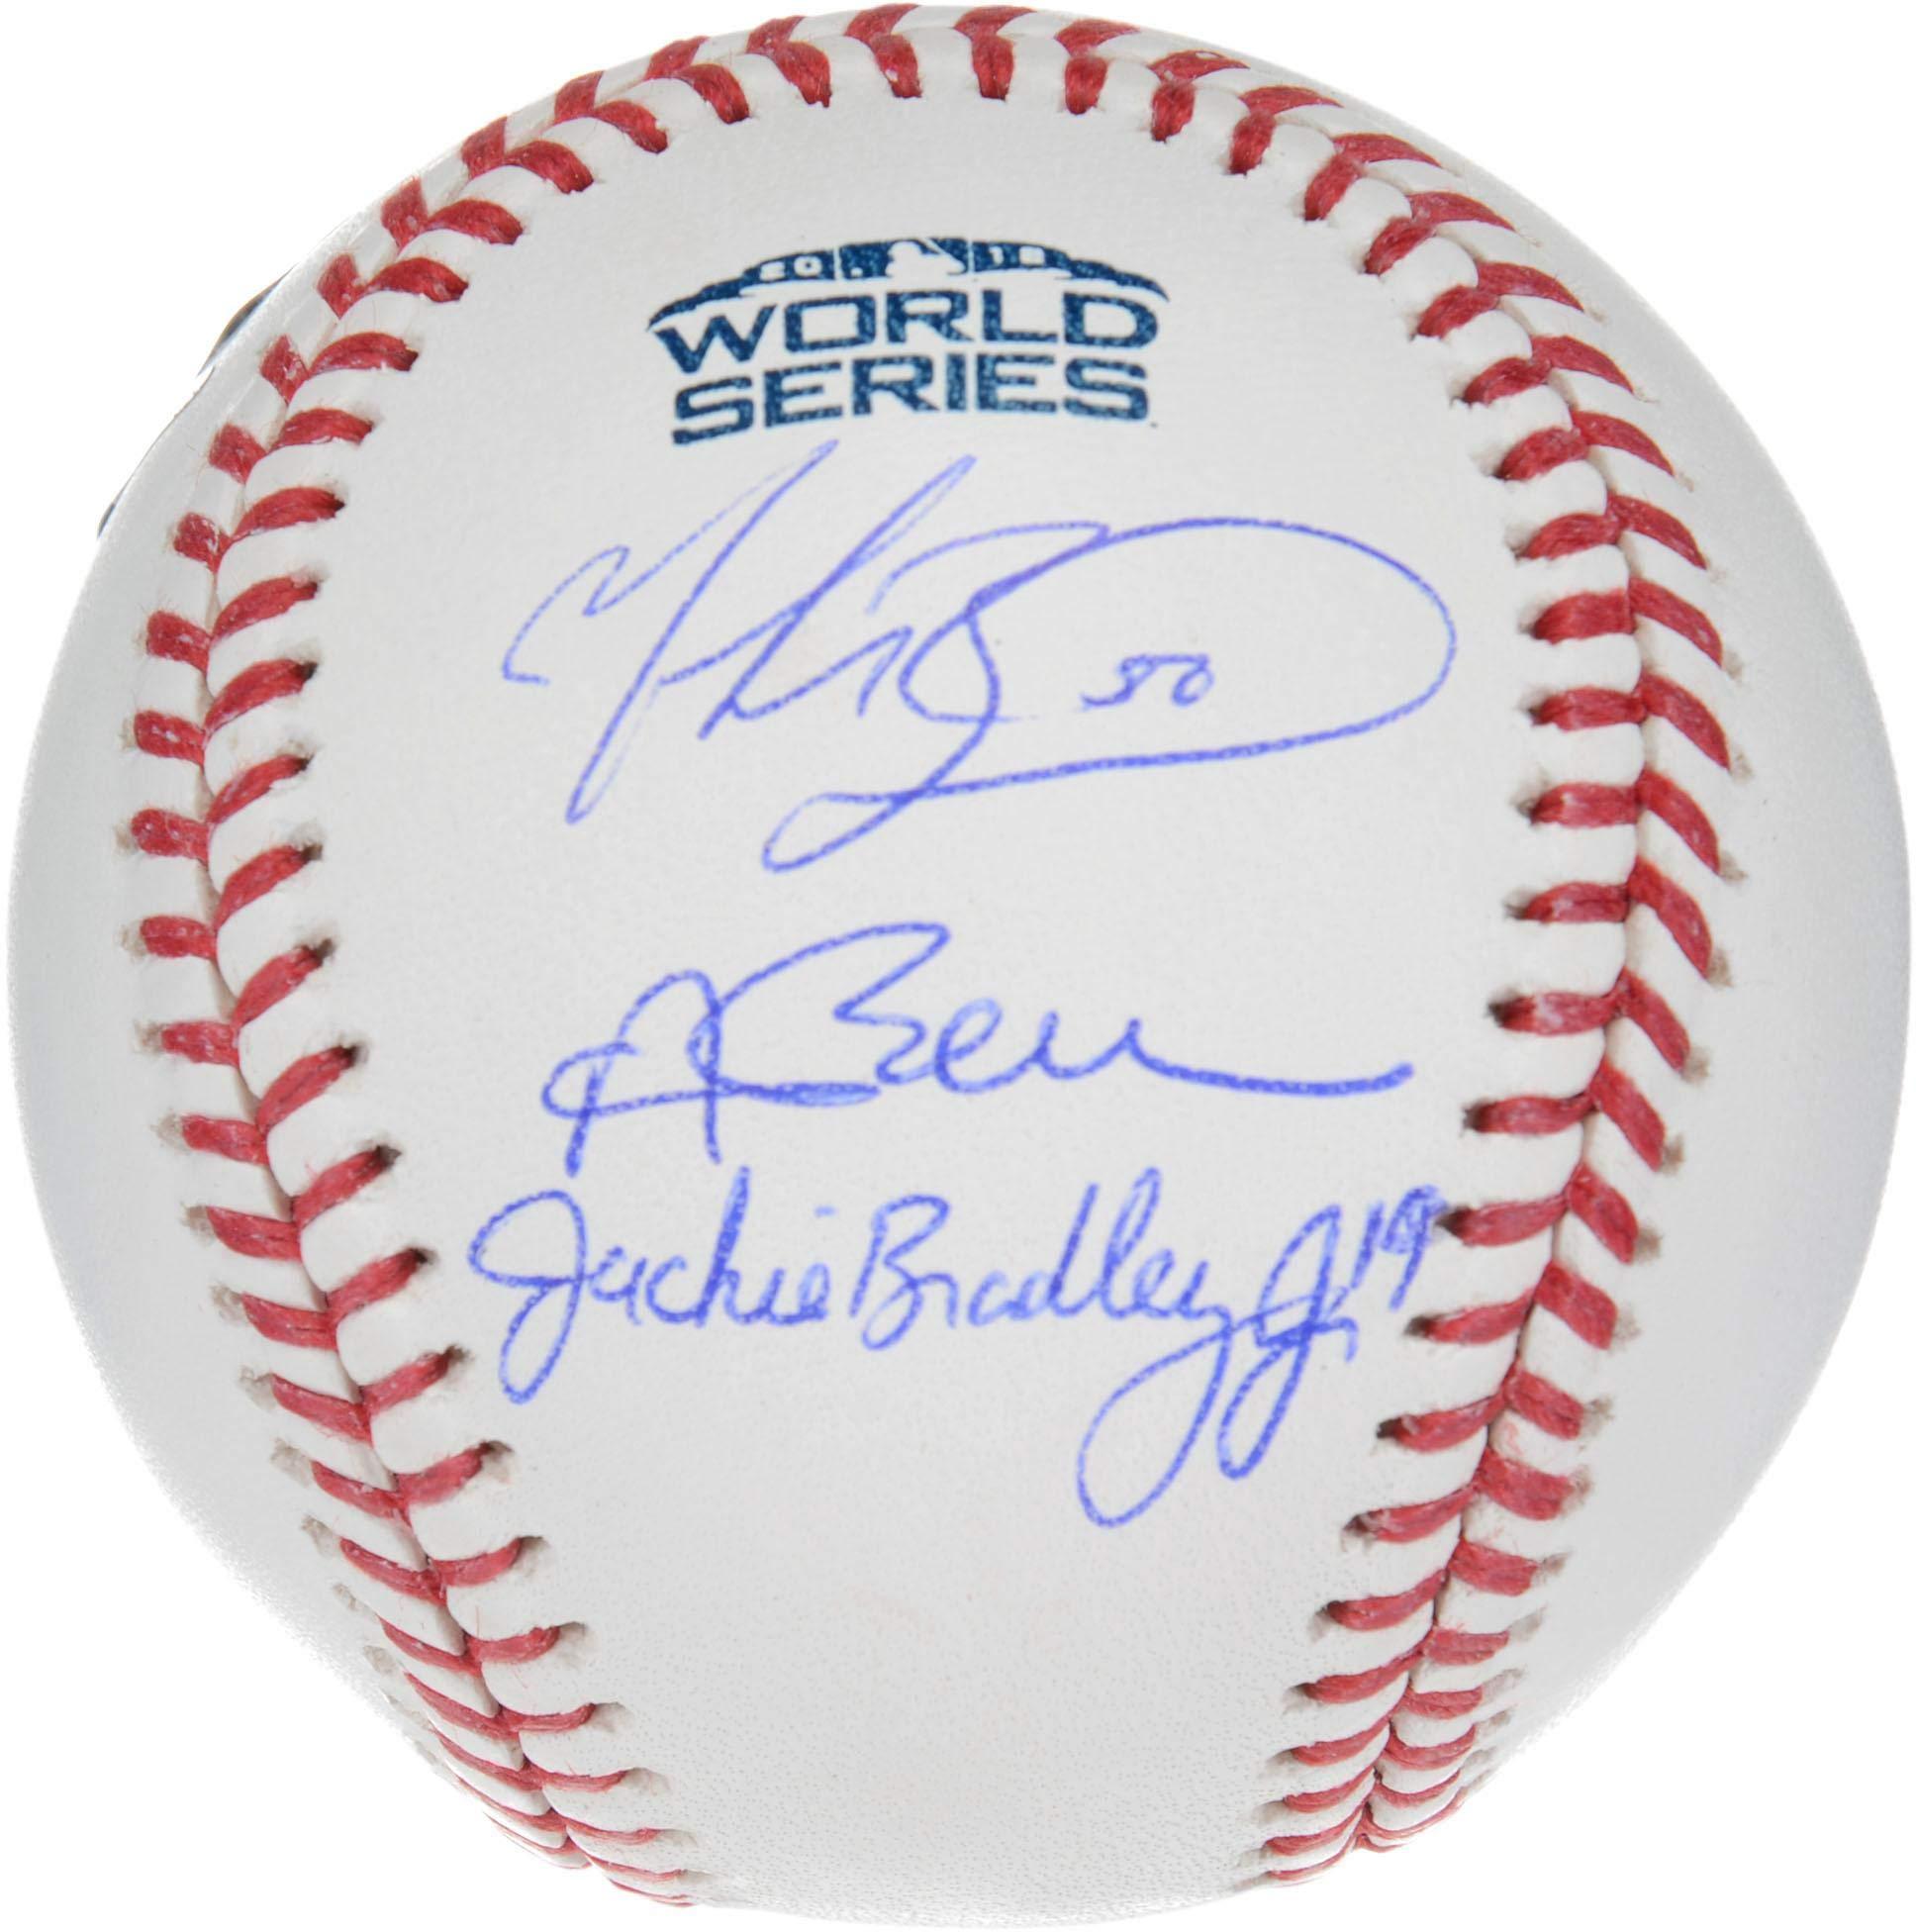 Andrew Benintendi, Mookie Betts and Jackie Bradley Jr. Boston Red Sox 2018 MLB World Series Champions Autographed Logo Baseball Fanatics Authentic Certified